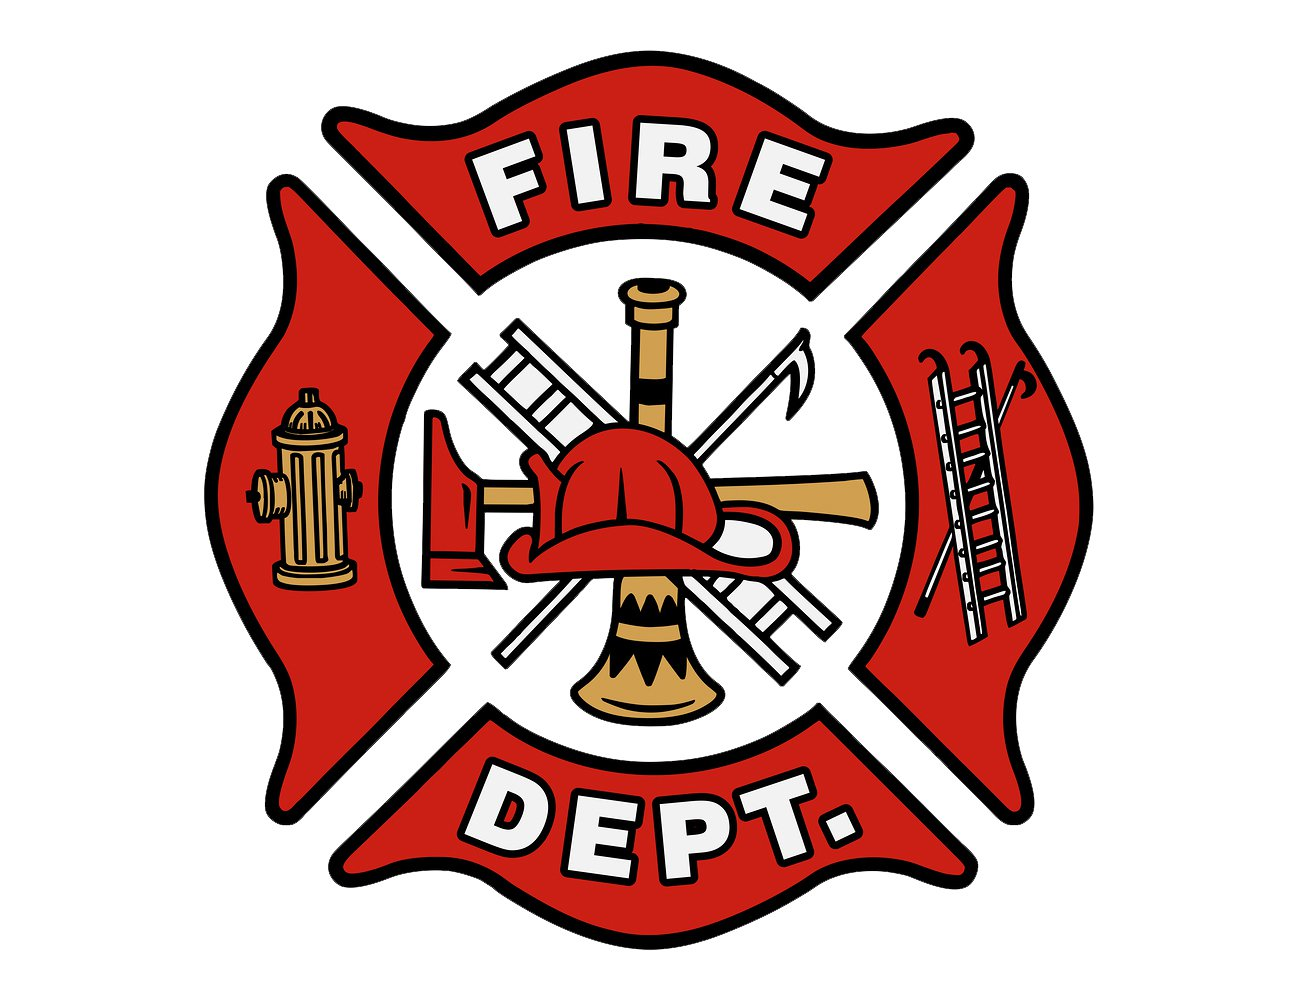 fire department logo  fire department symbol  meaning fire dept logos clip art fire dept logo vector